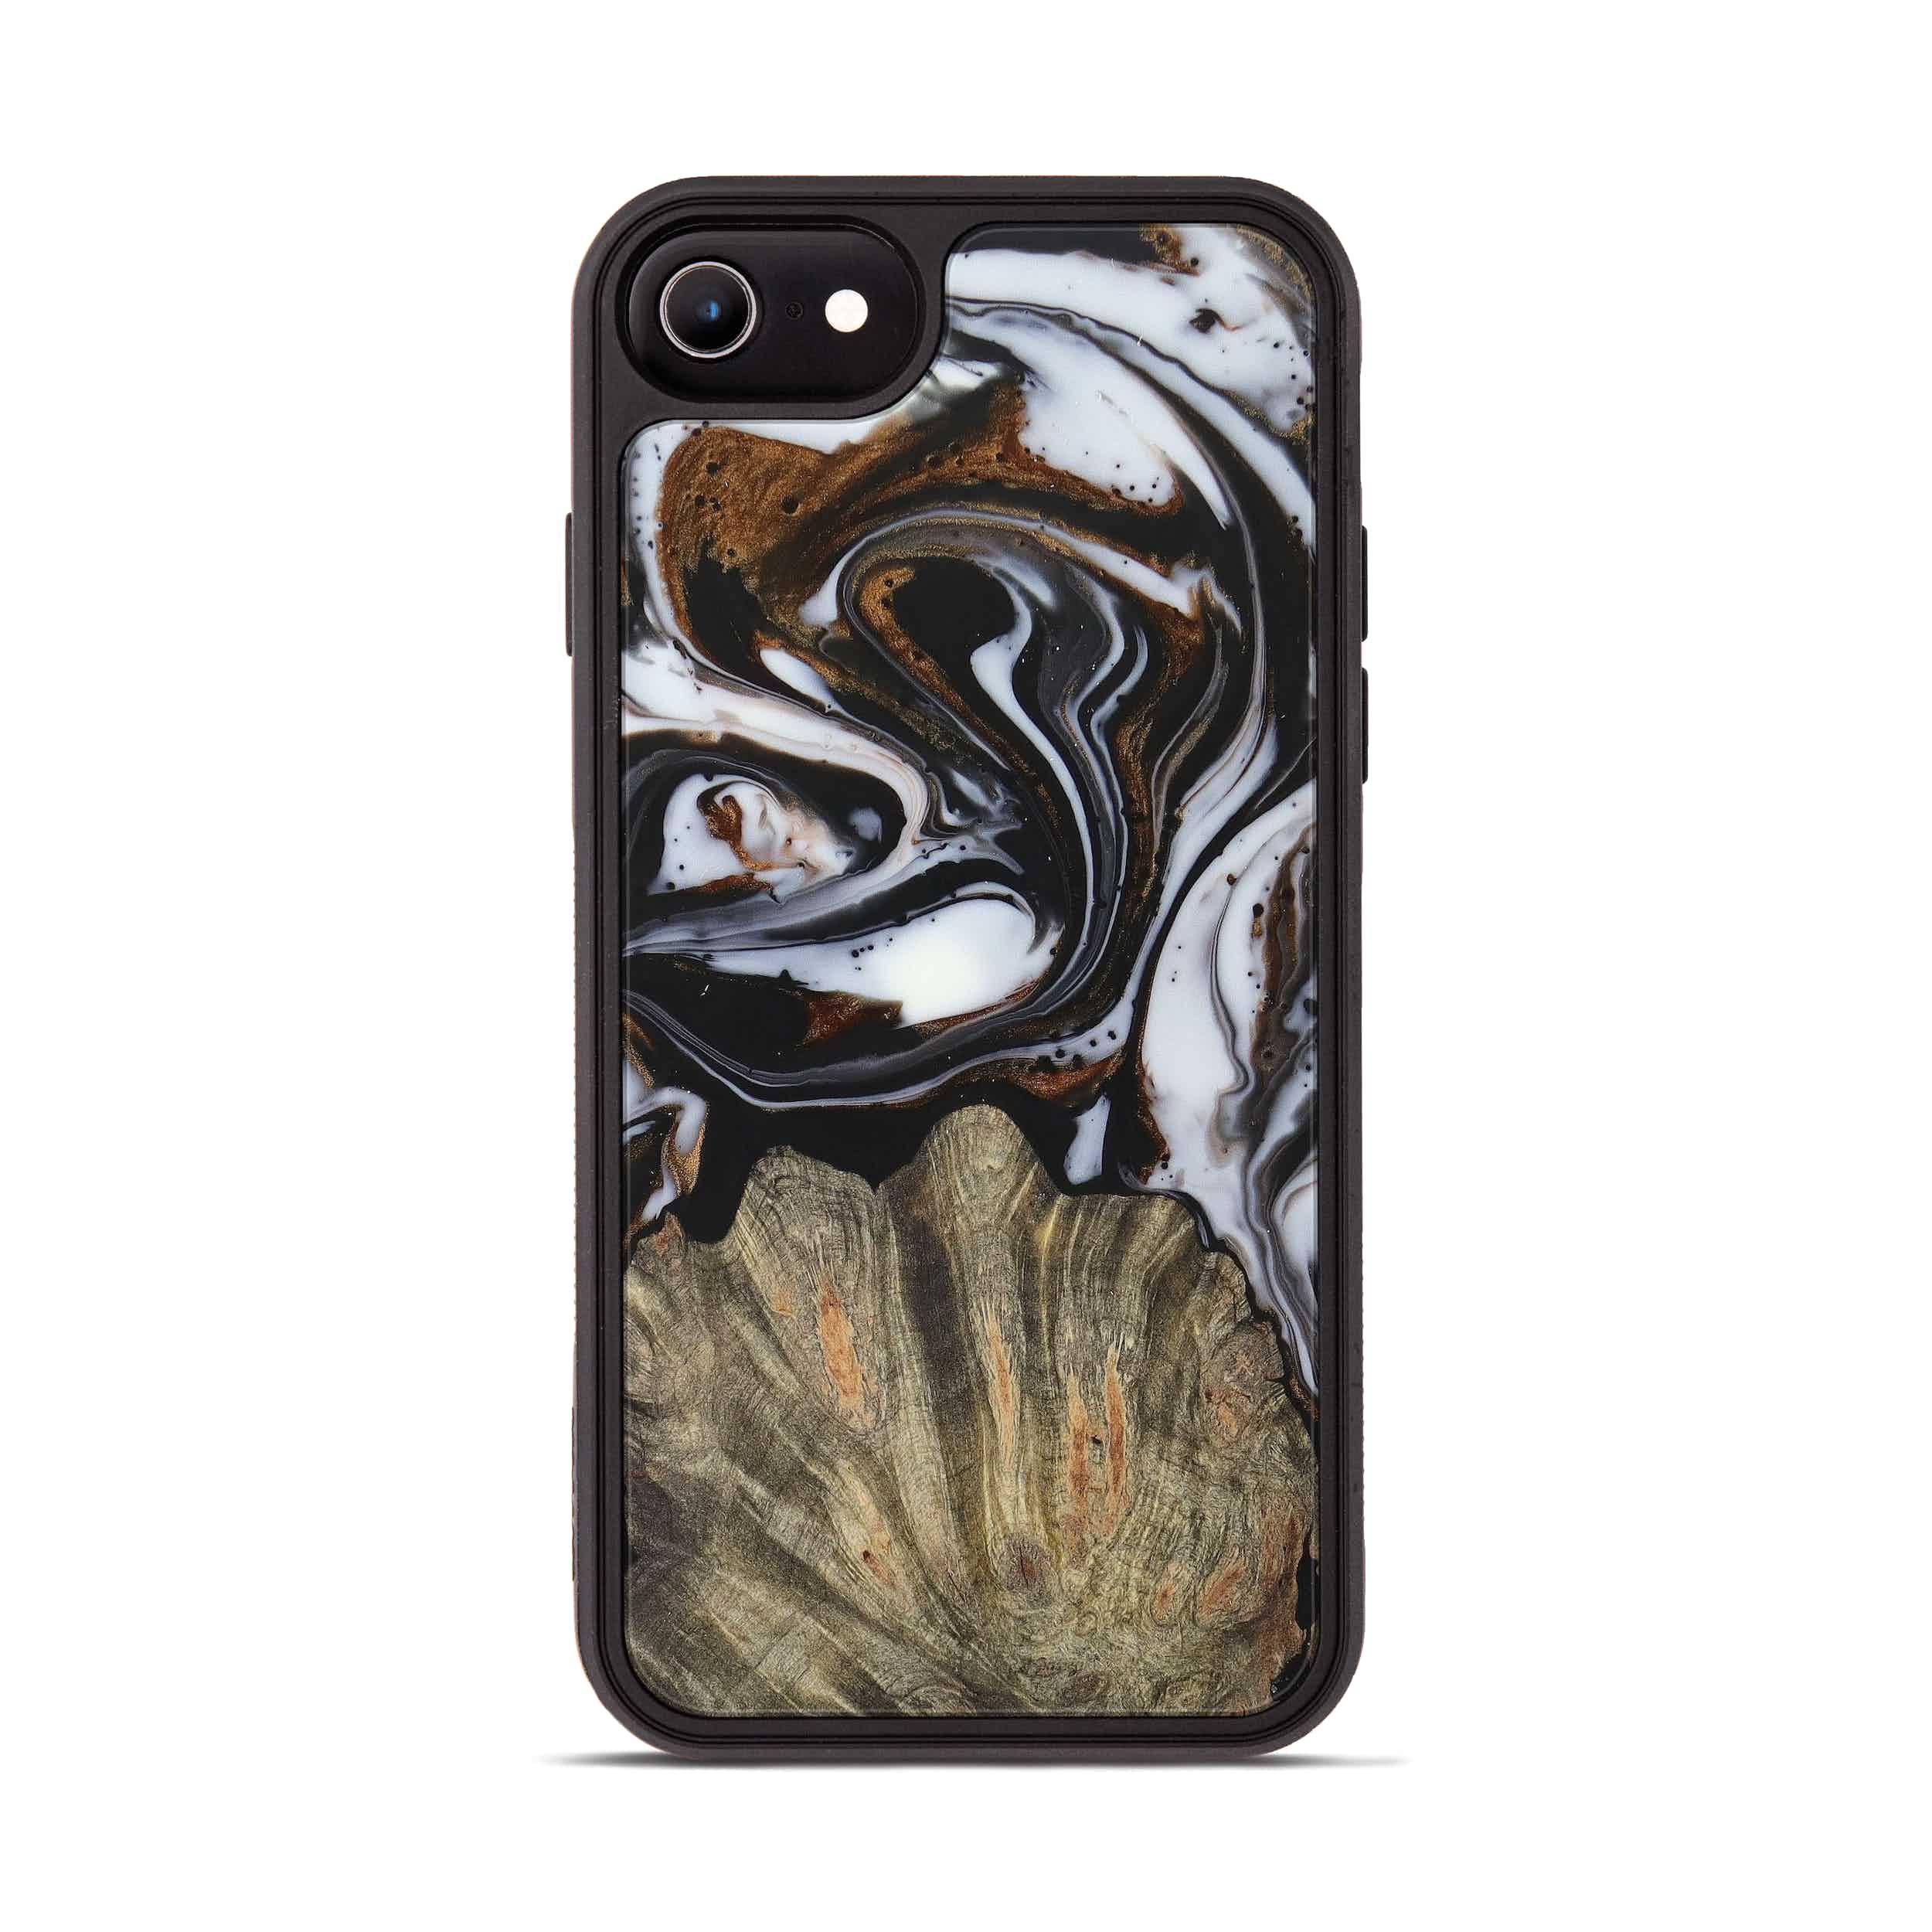 iPhone 8 Wood+Resin Phone Case - Lynnelle (Black & White, 390664)